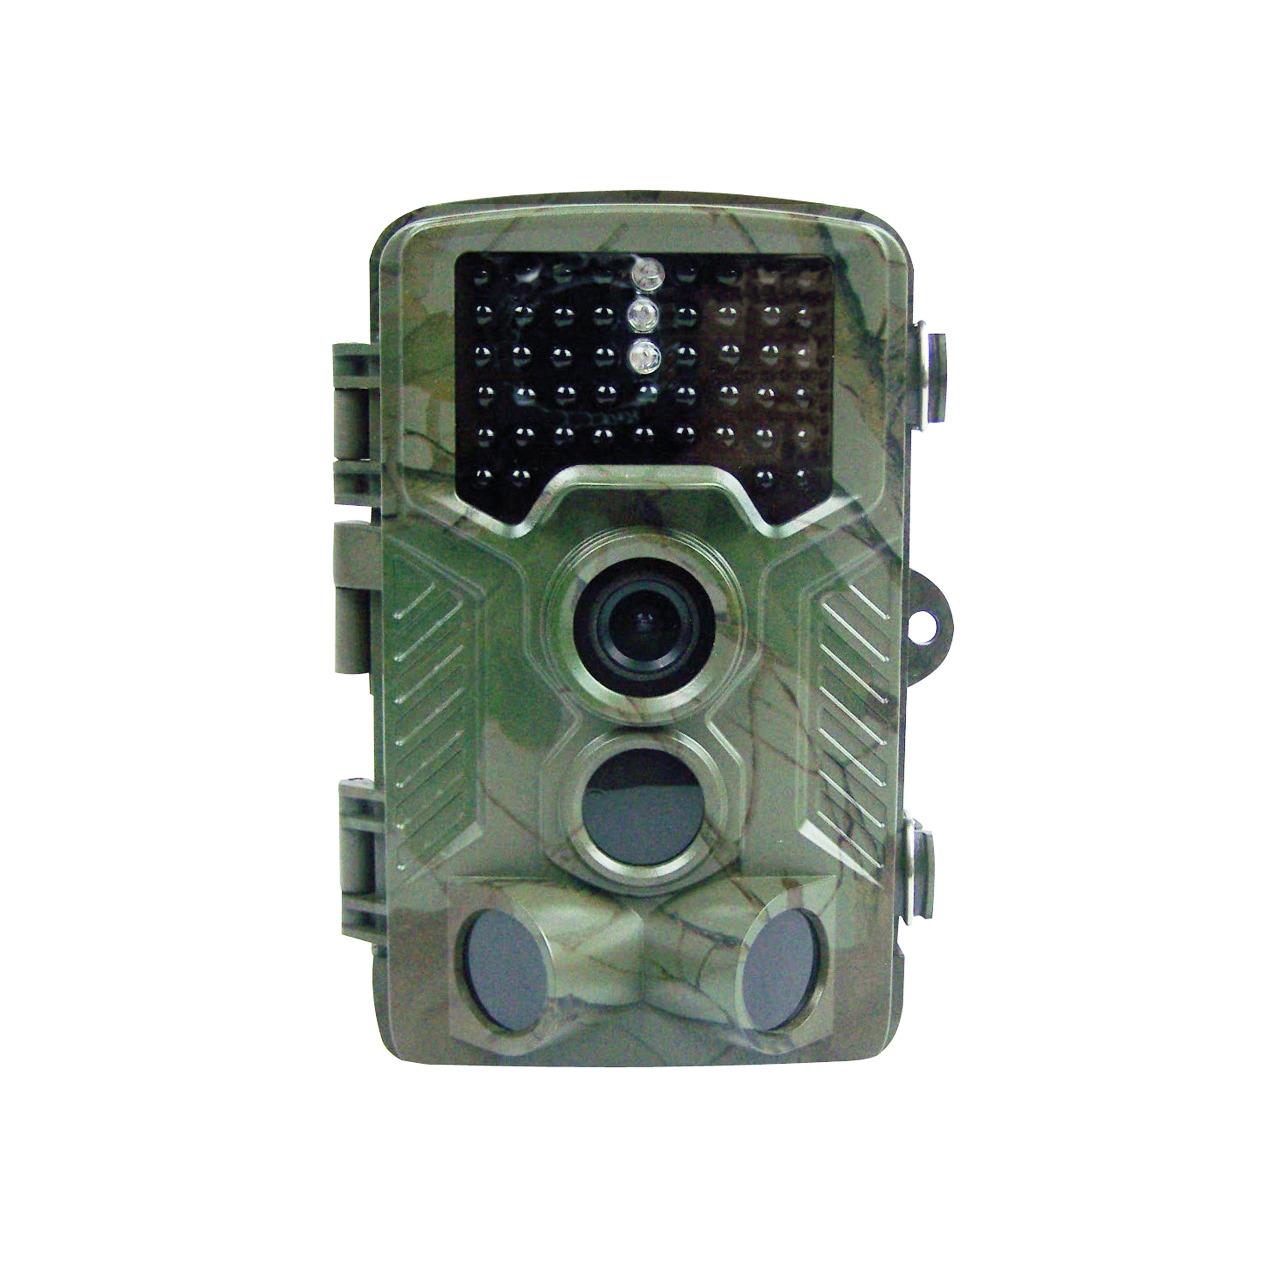 Berger und Schröter Full HD 16 MP Fotofalle- Wildkamera Scouting Cam 31646 mit BLACK-LED's